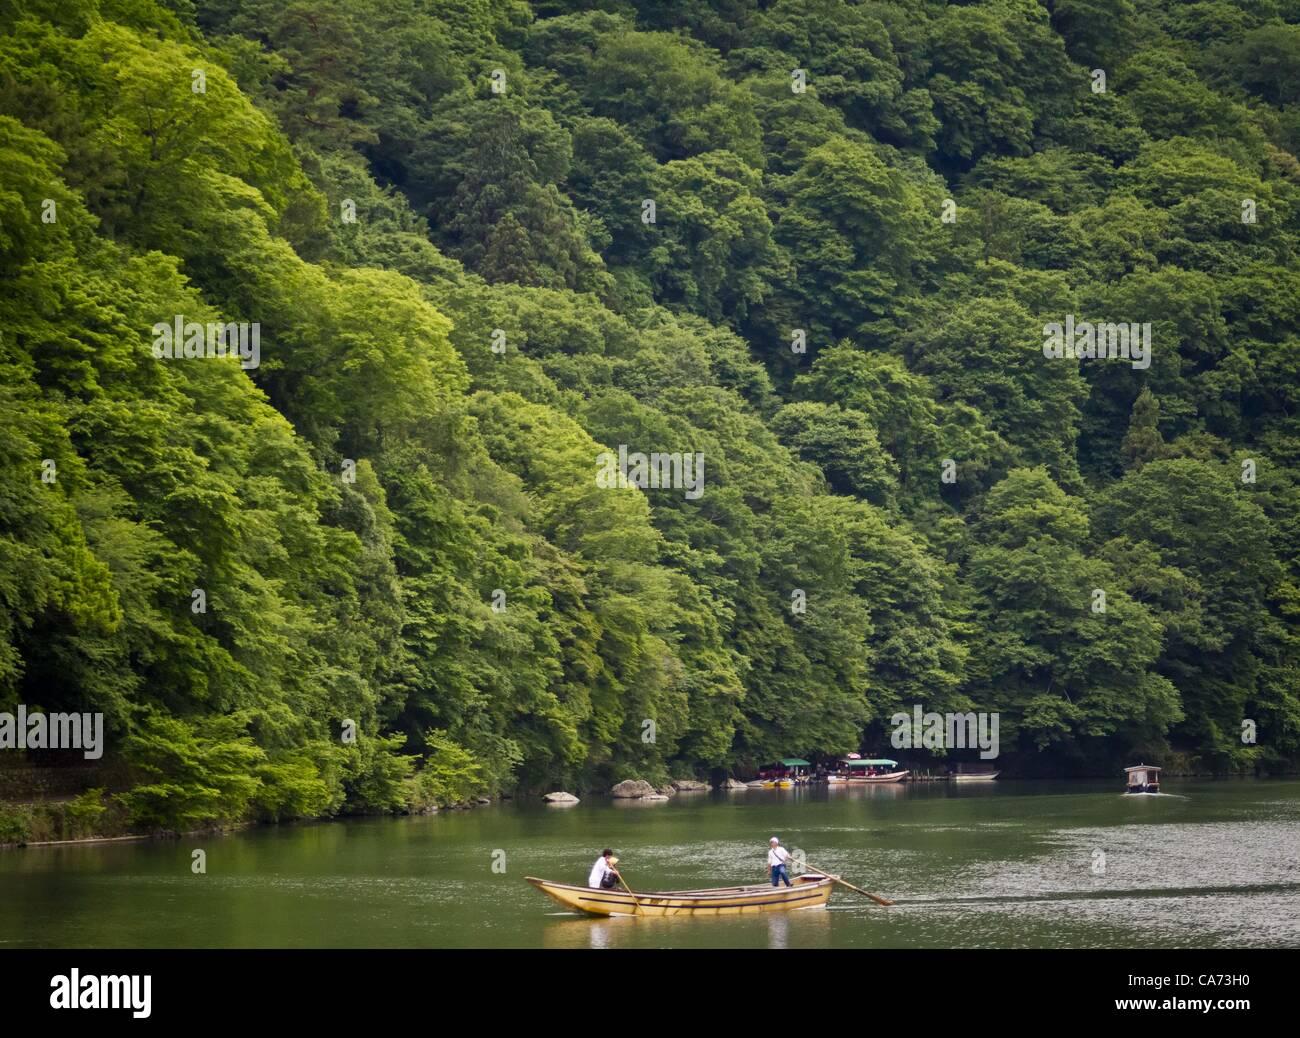 June 13, 2012 - Kyoto, Japan - June 13, 2012 - Kyoto, Japan - Boatmen on the Hozu river near Arashiyama Monkey Park - Stock Image